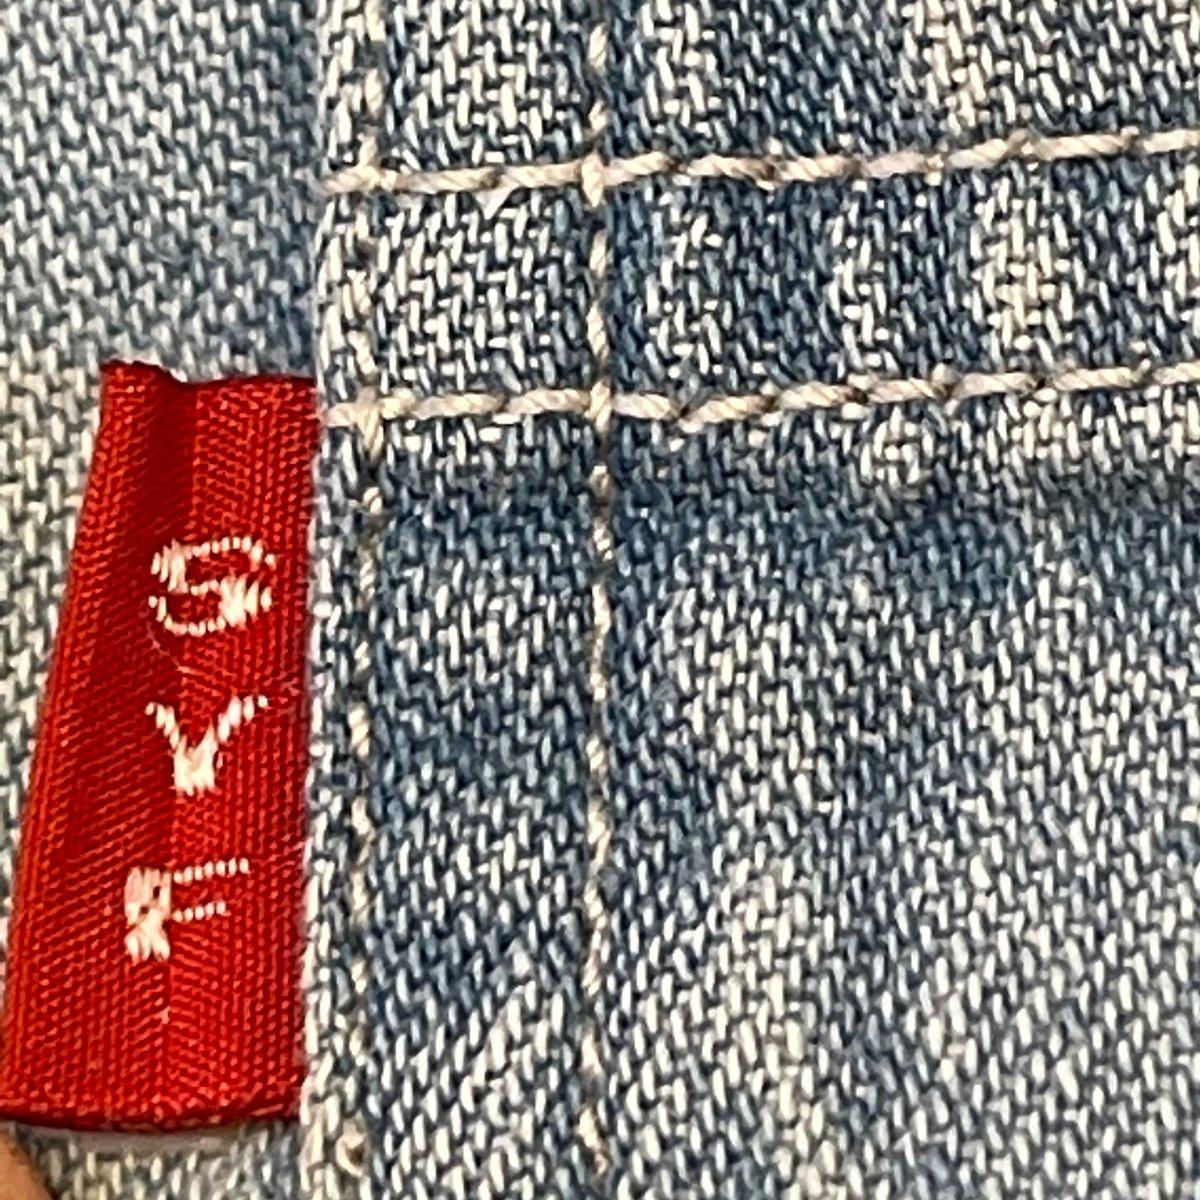 Original Vintage Grateful Dead Crew 90's SYF Denim Long Sleeve!!! Tagged Large. Fits XL!